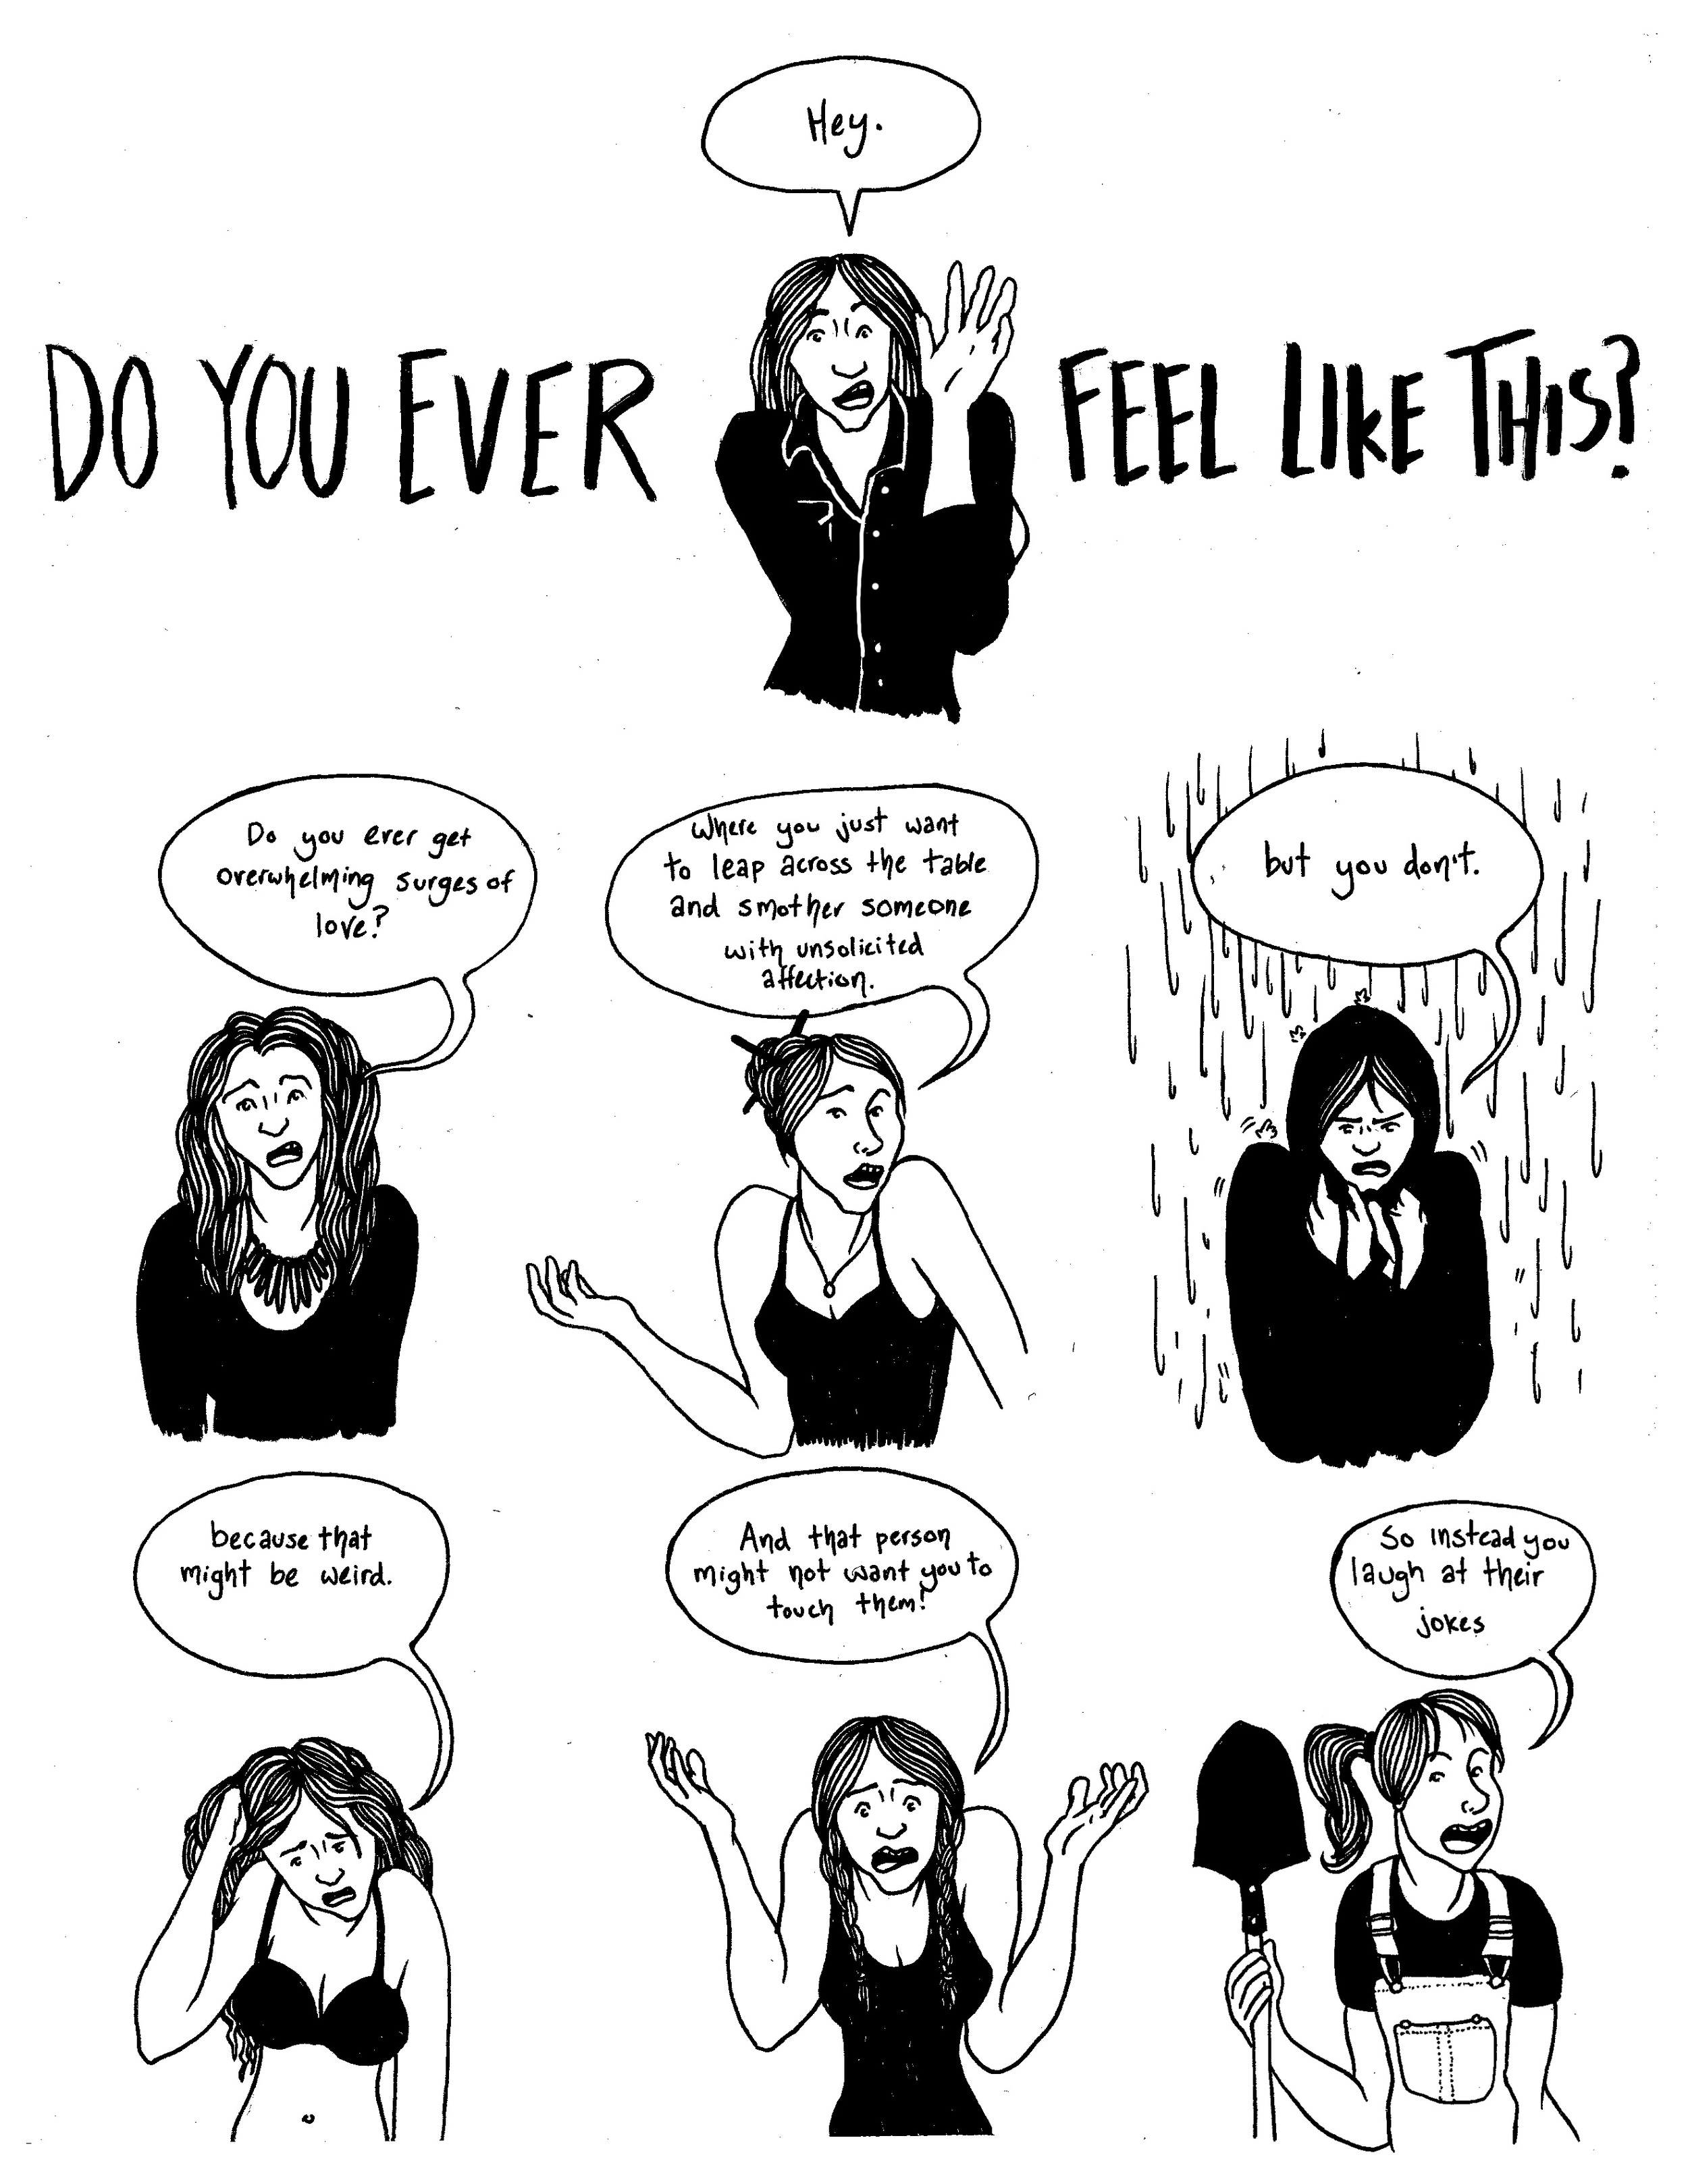 Do You ever Feel Like This1.jpg